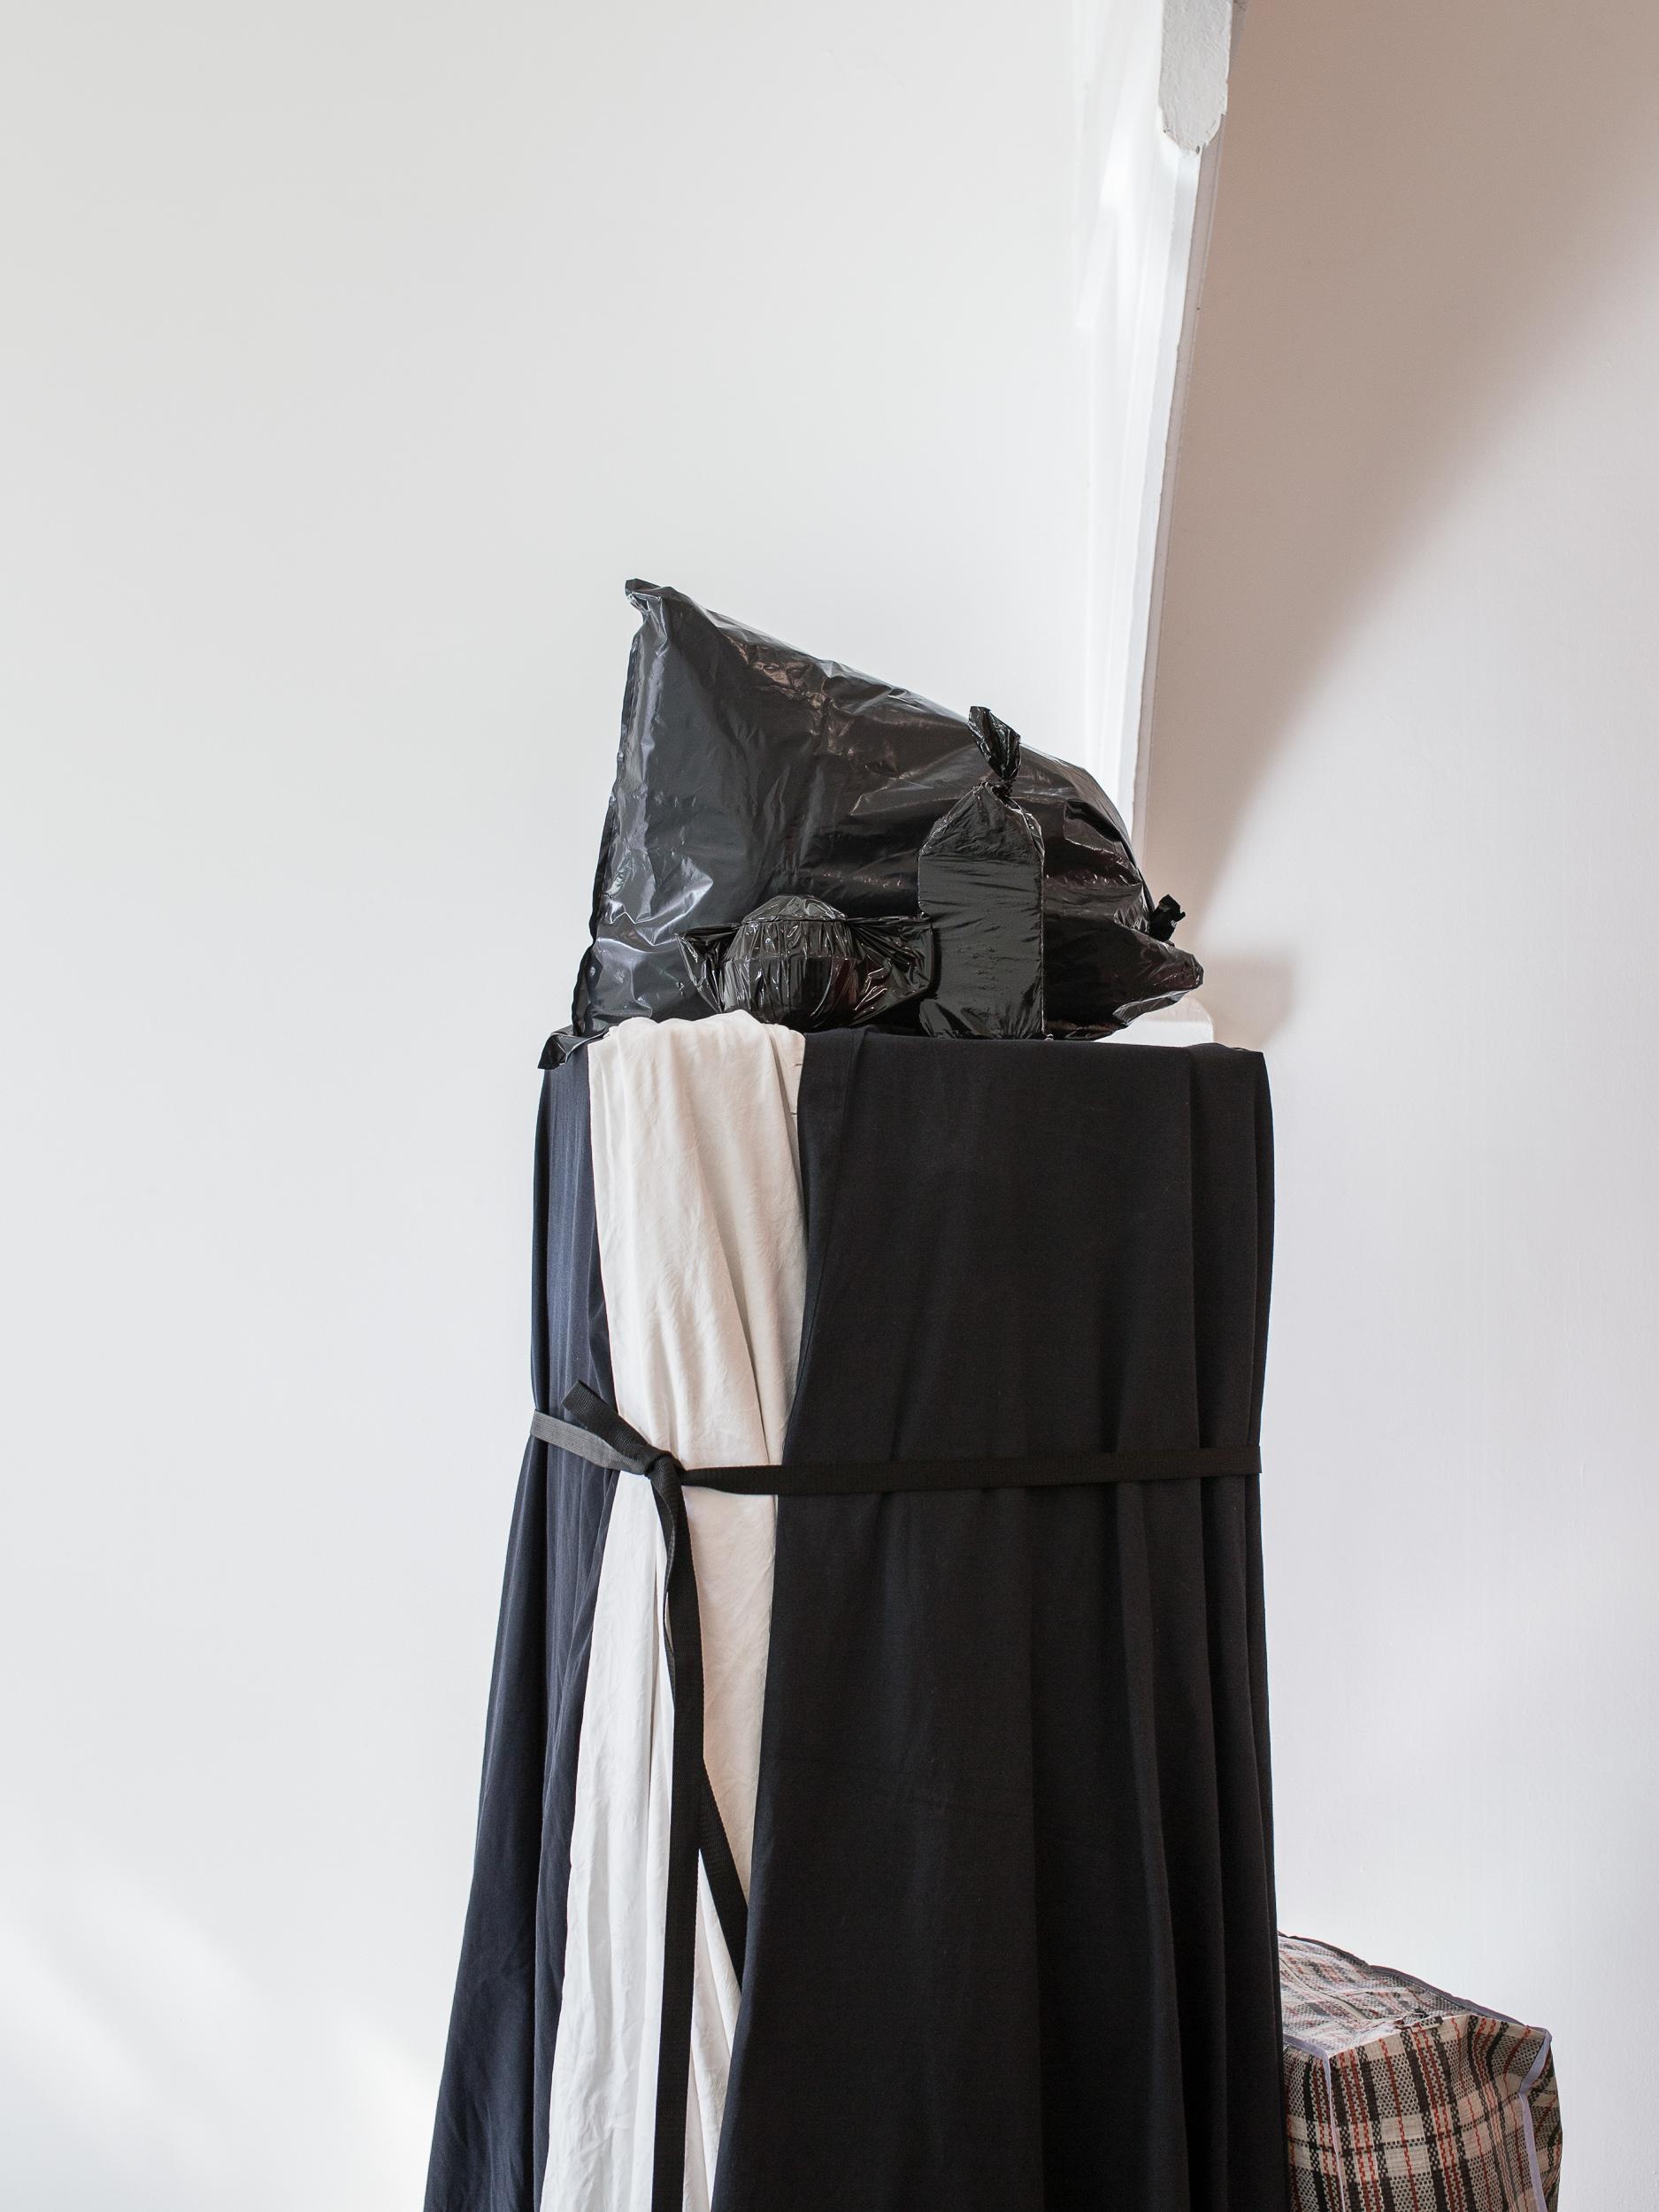 Osman Yousefzada at Ikon Gallery2.jpg